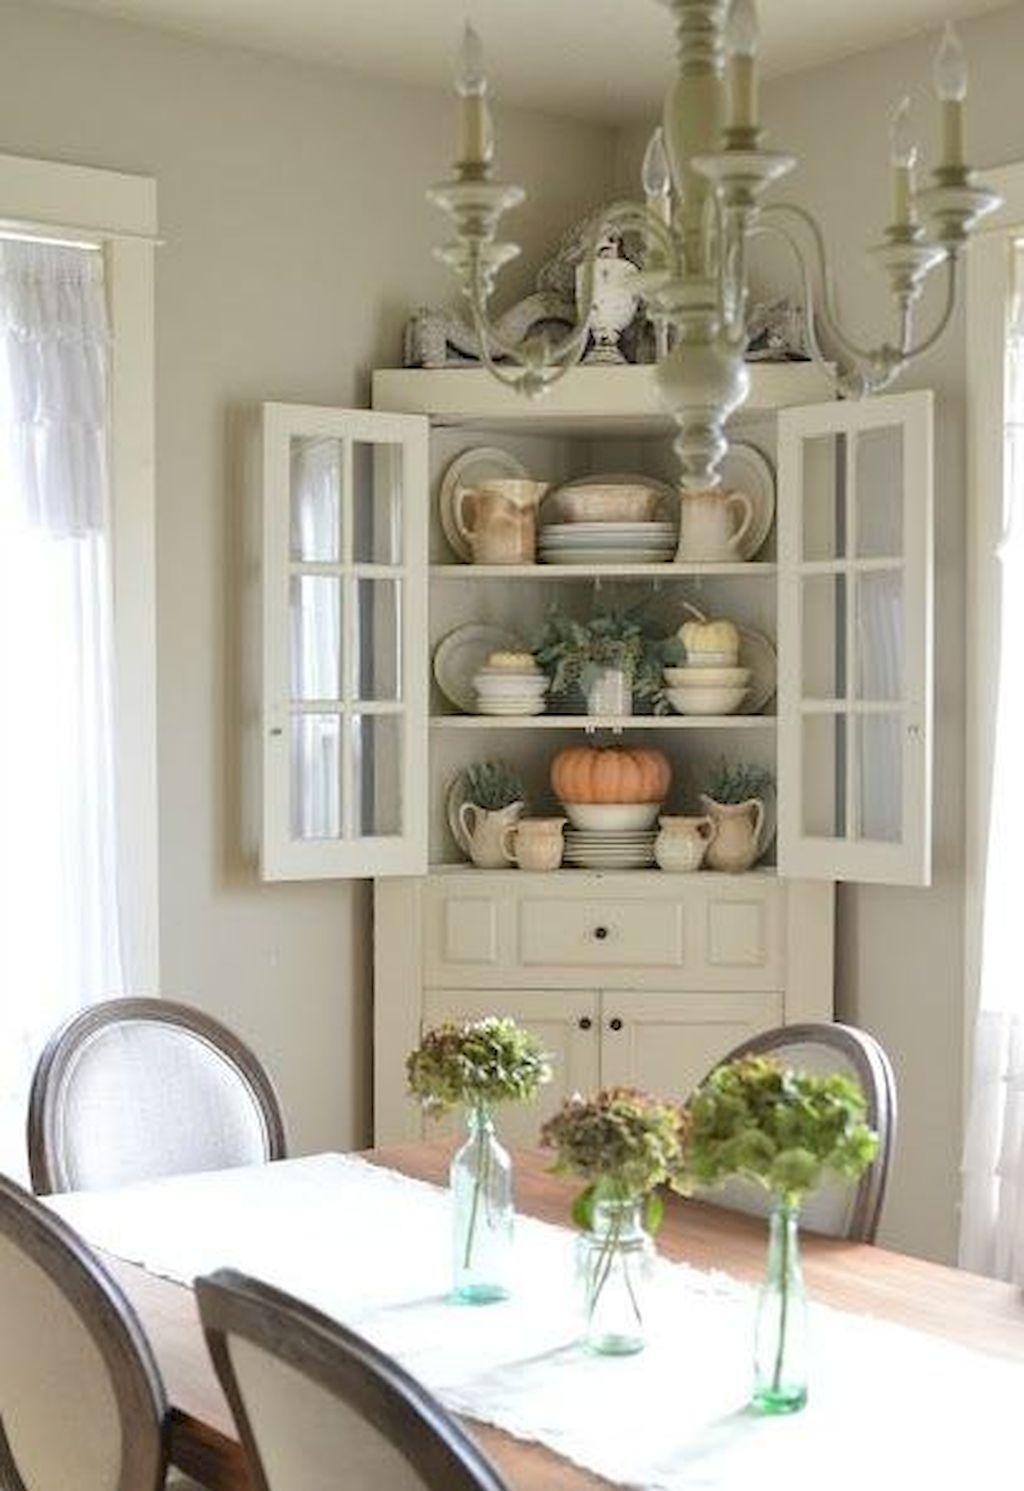 90 Amazing Small Dining Room Decor Ideas 90 Amazing Small Dining